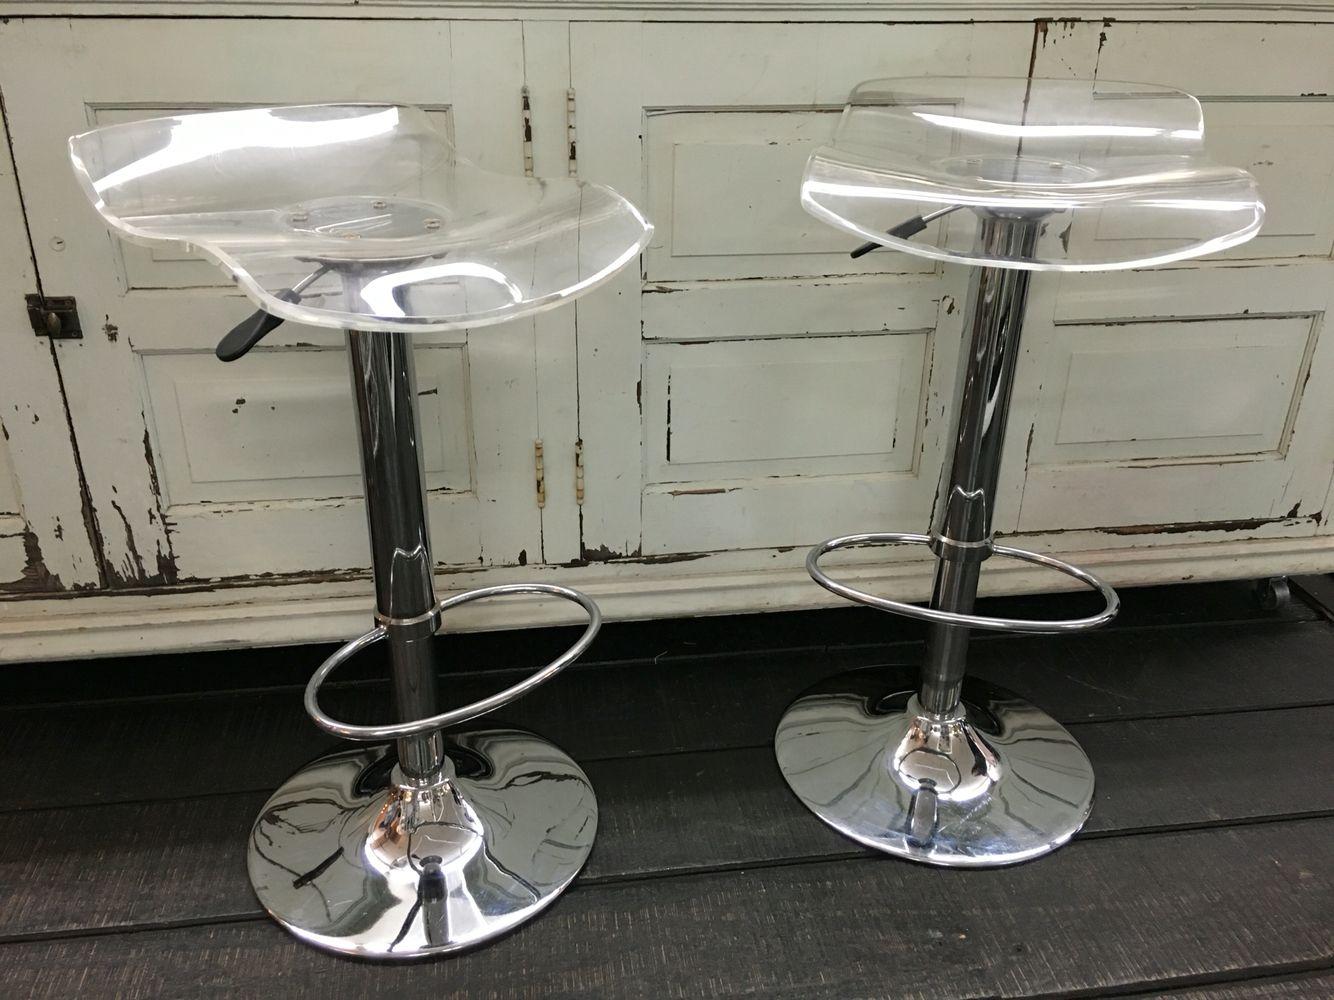 Cool pneumatic lucite chairs at the Agoura Antique Mart! Modern, sleek, comfy & stylish! @littleleslieboo